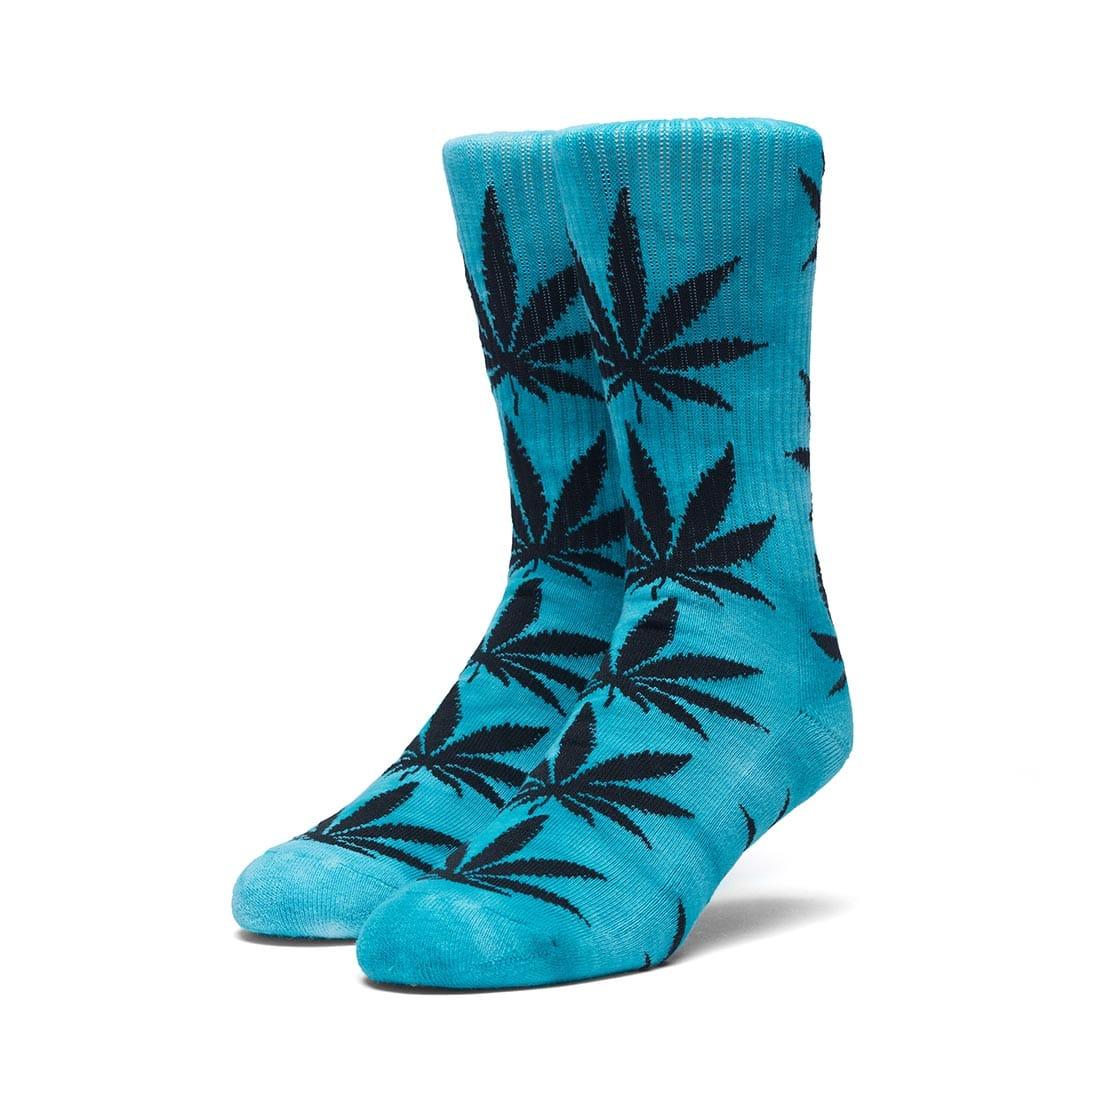 HUF Plantlife Crew Socks - Jade